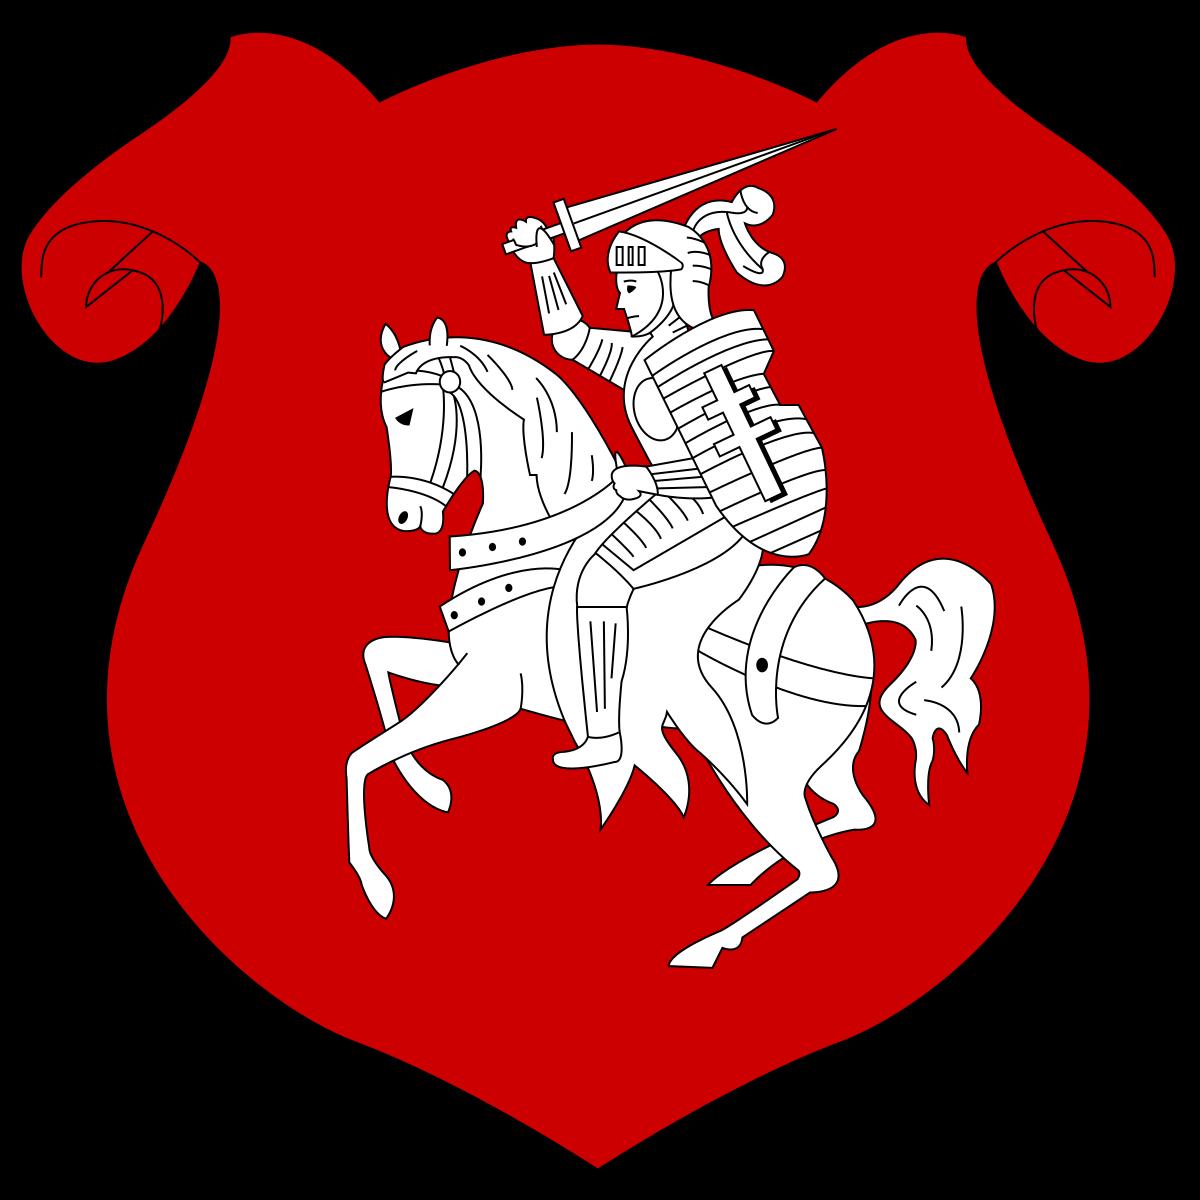 Congress clipart paris treaty. Rada of the belarusian